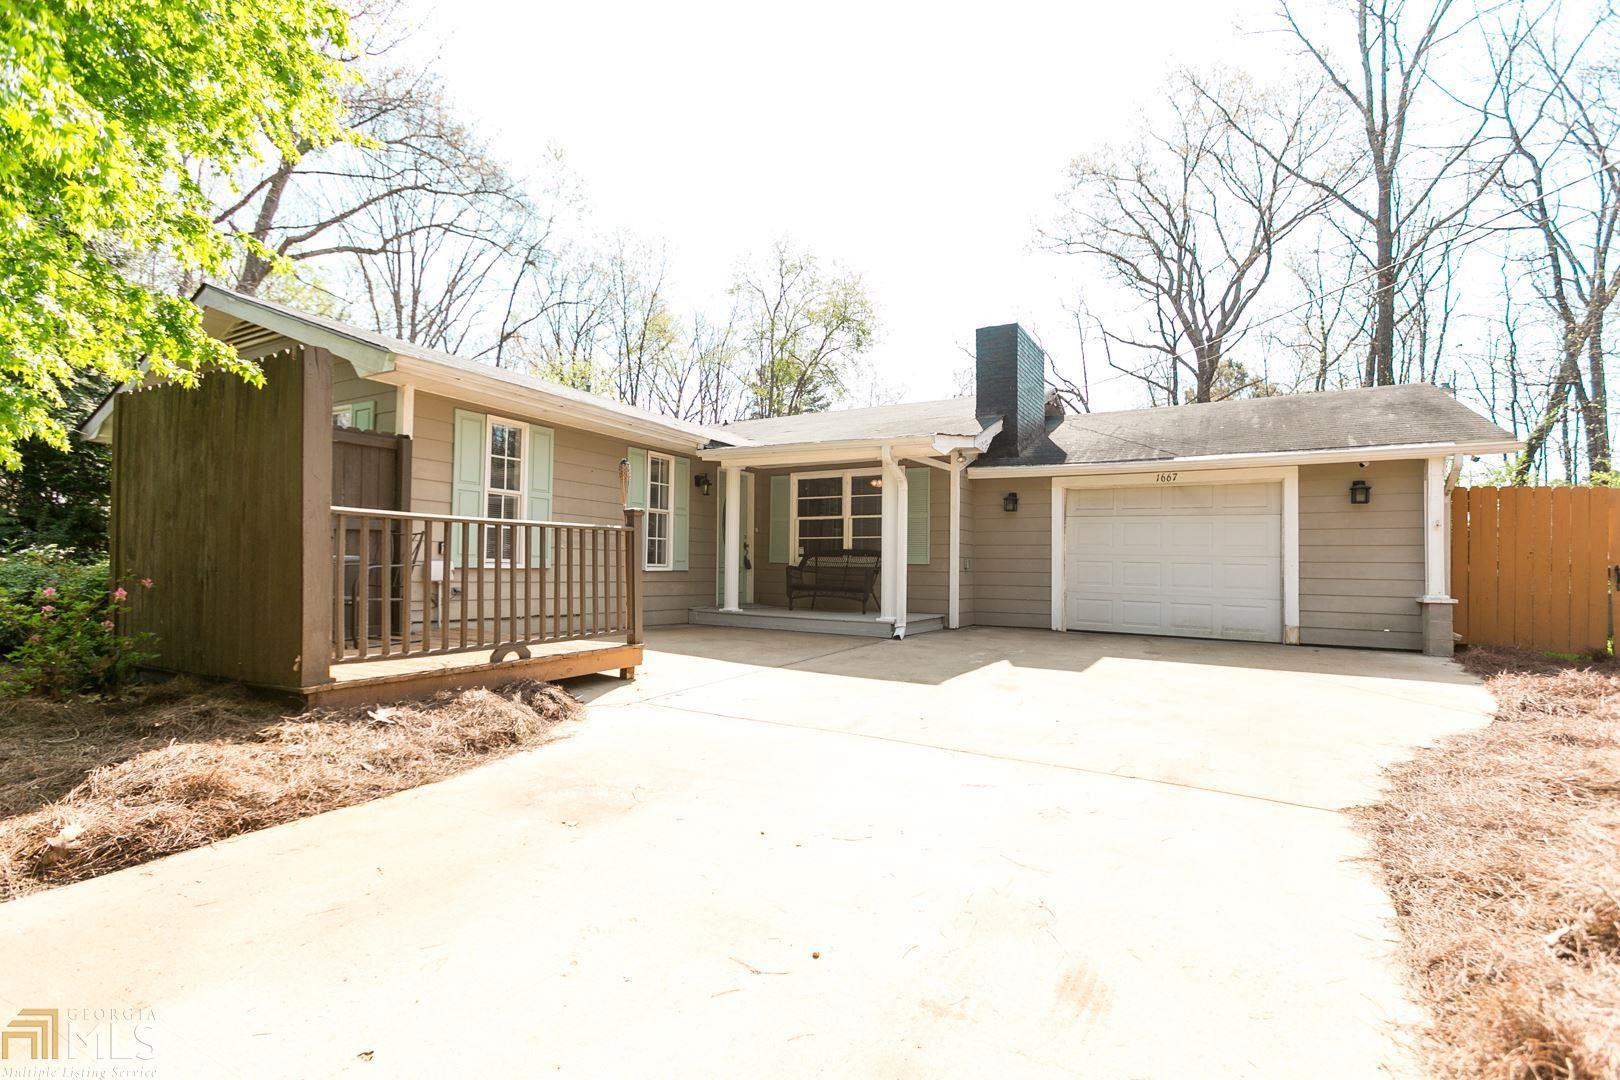 1667 Dogwood Trl, Monroe, GA 30655 - #: 8762077